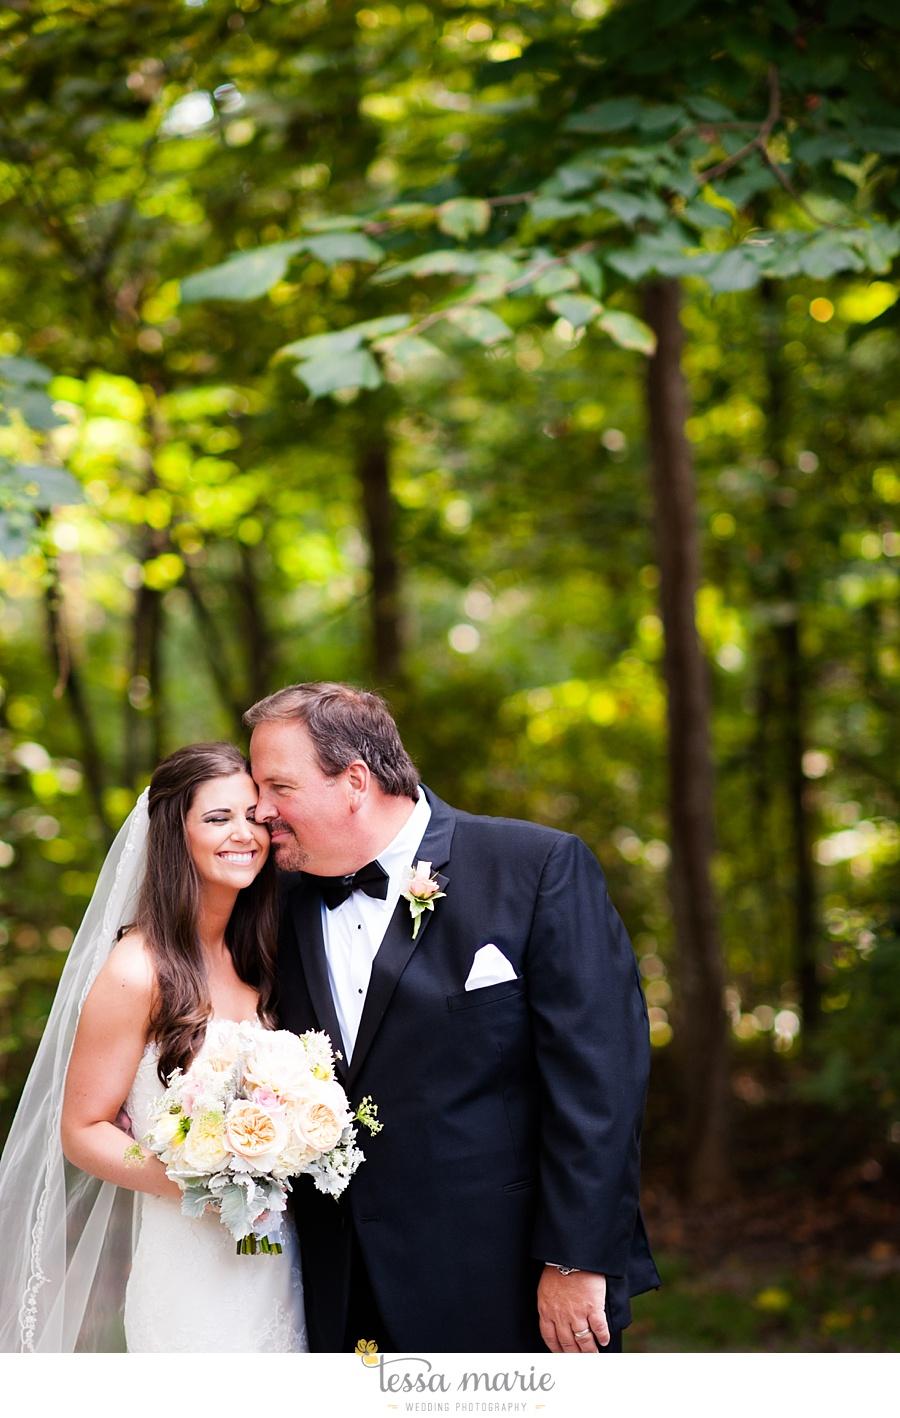 outdoor_wedding_pictures_marietta_sweethearts_candid_emotional_tessa_marie_weddings_0117